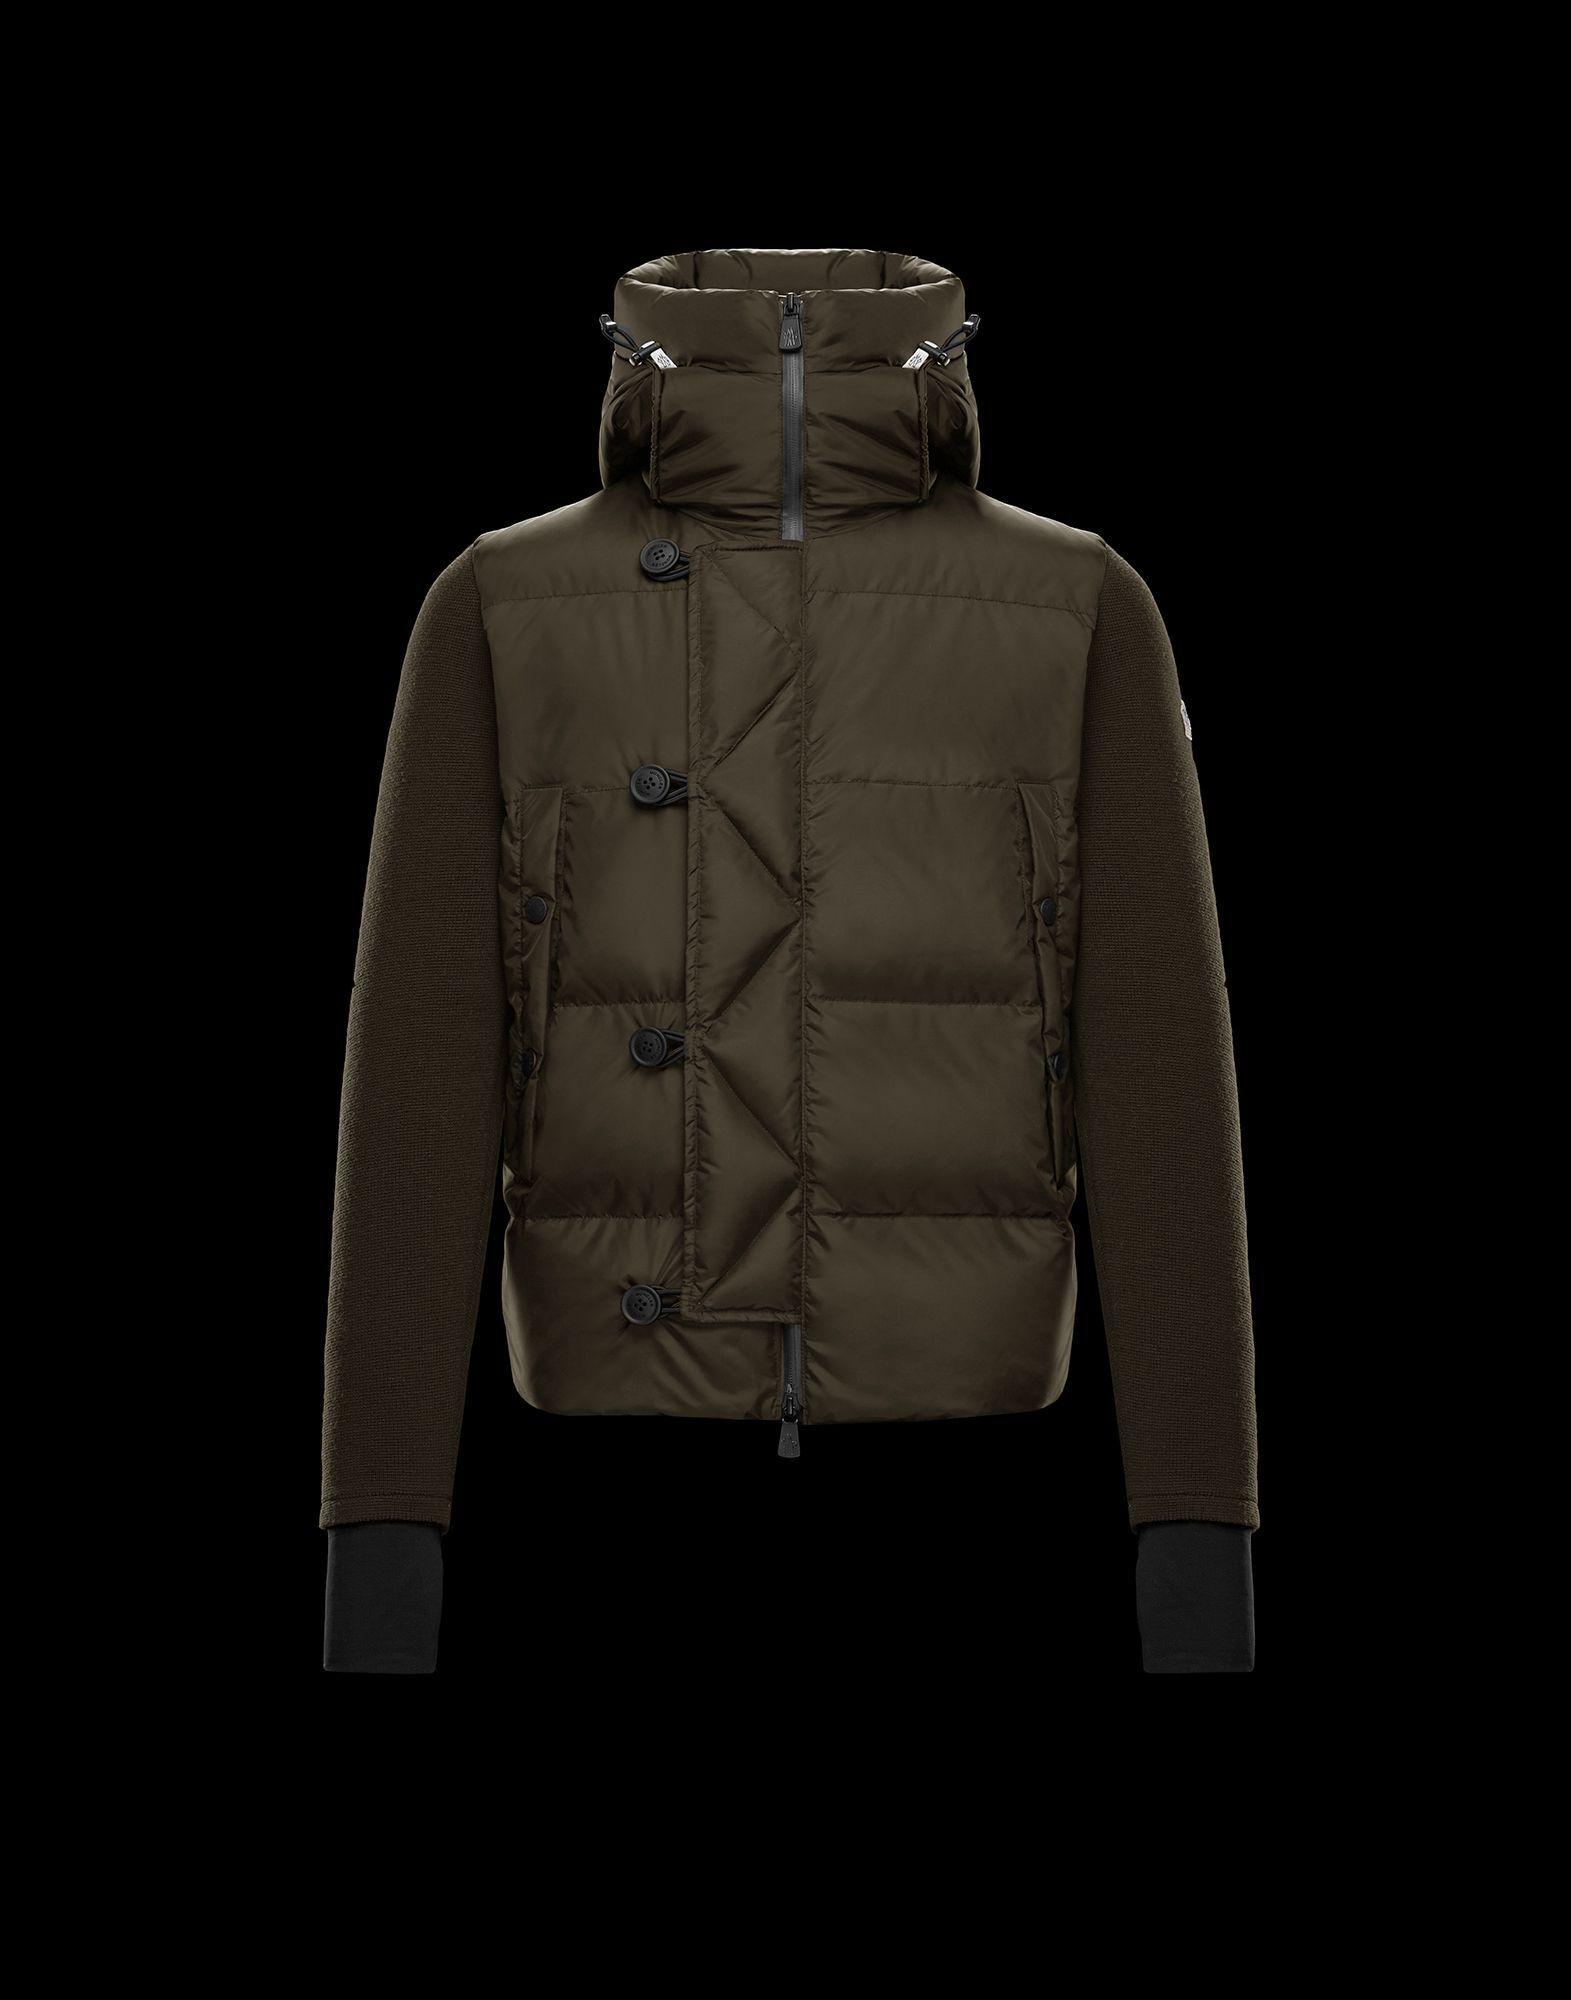 moncler (With images) Japan design, Winter jackets